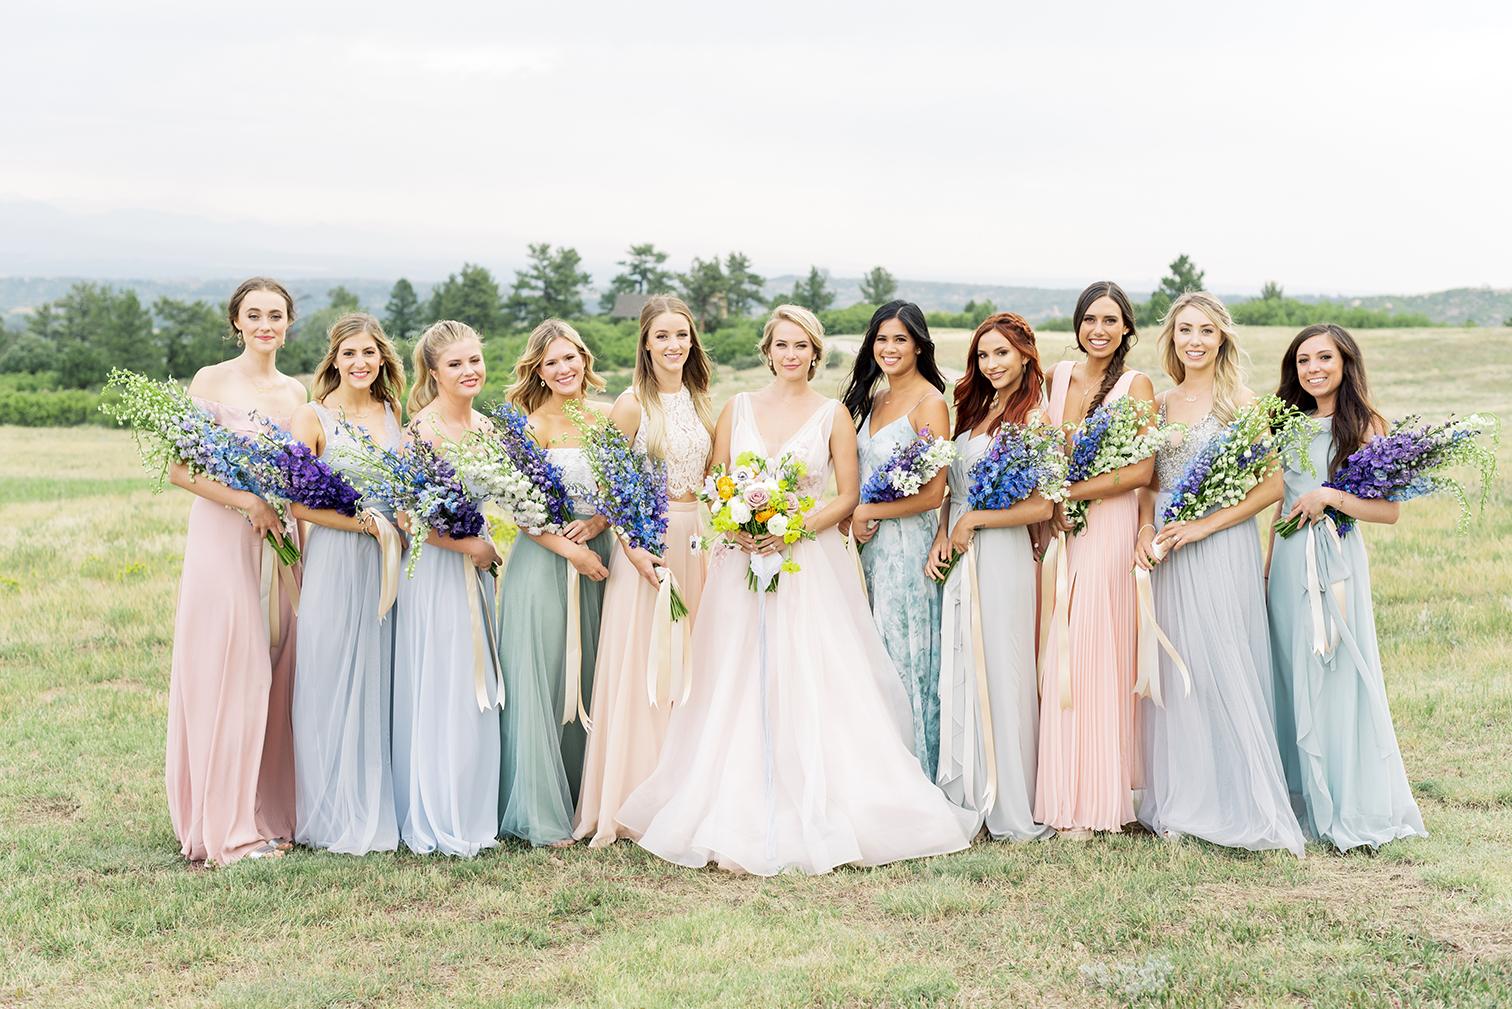 Colorado Wedding Photographers, Bride with Bridesmaids, Colorful Bridesmaids dresses, Denver Weddings, Brides Feature